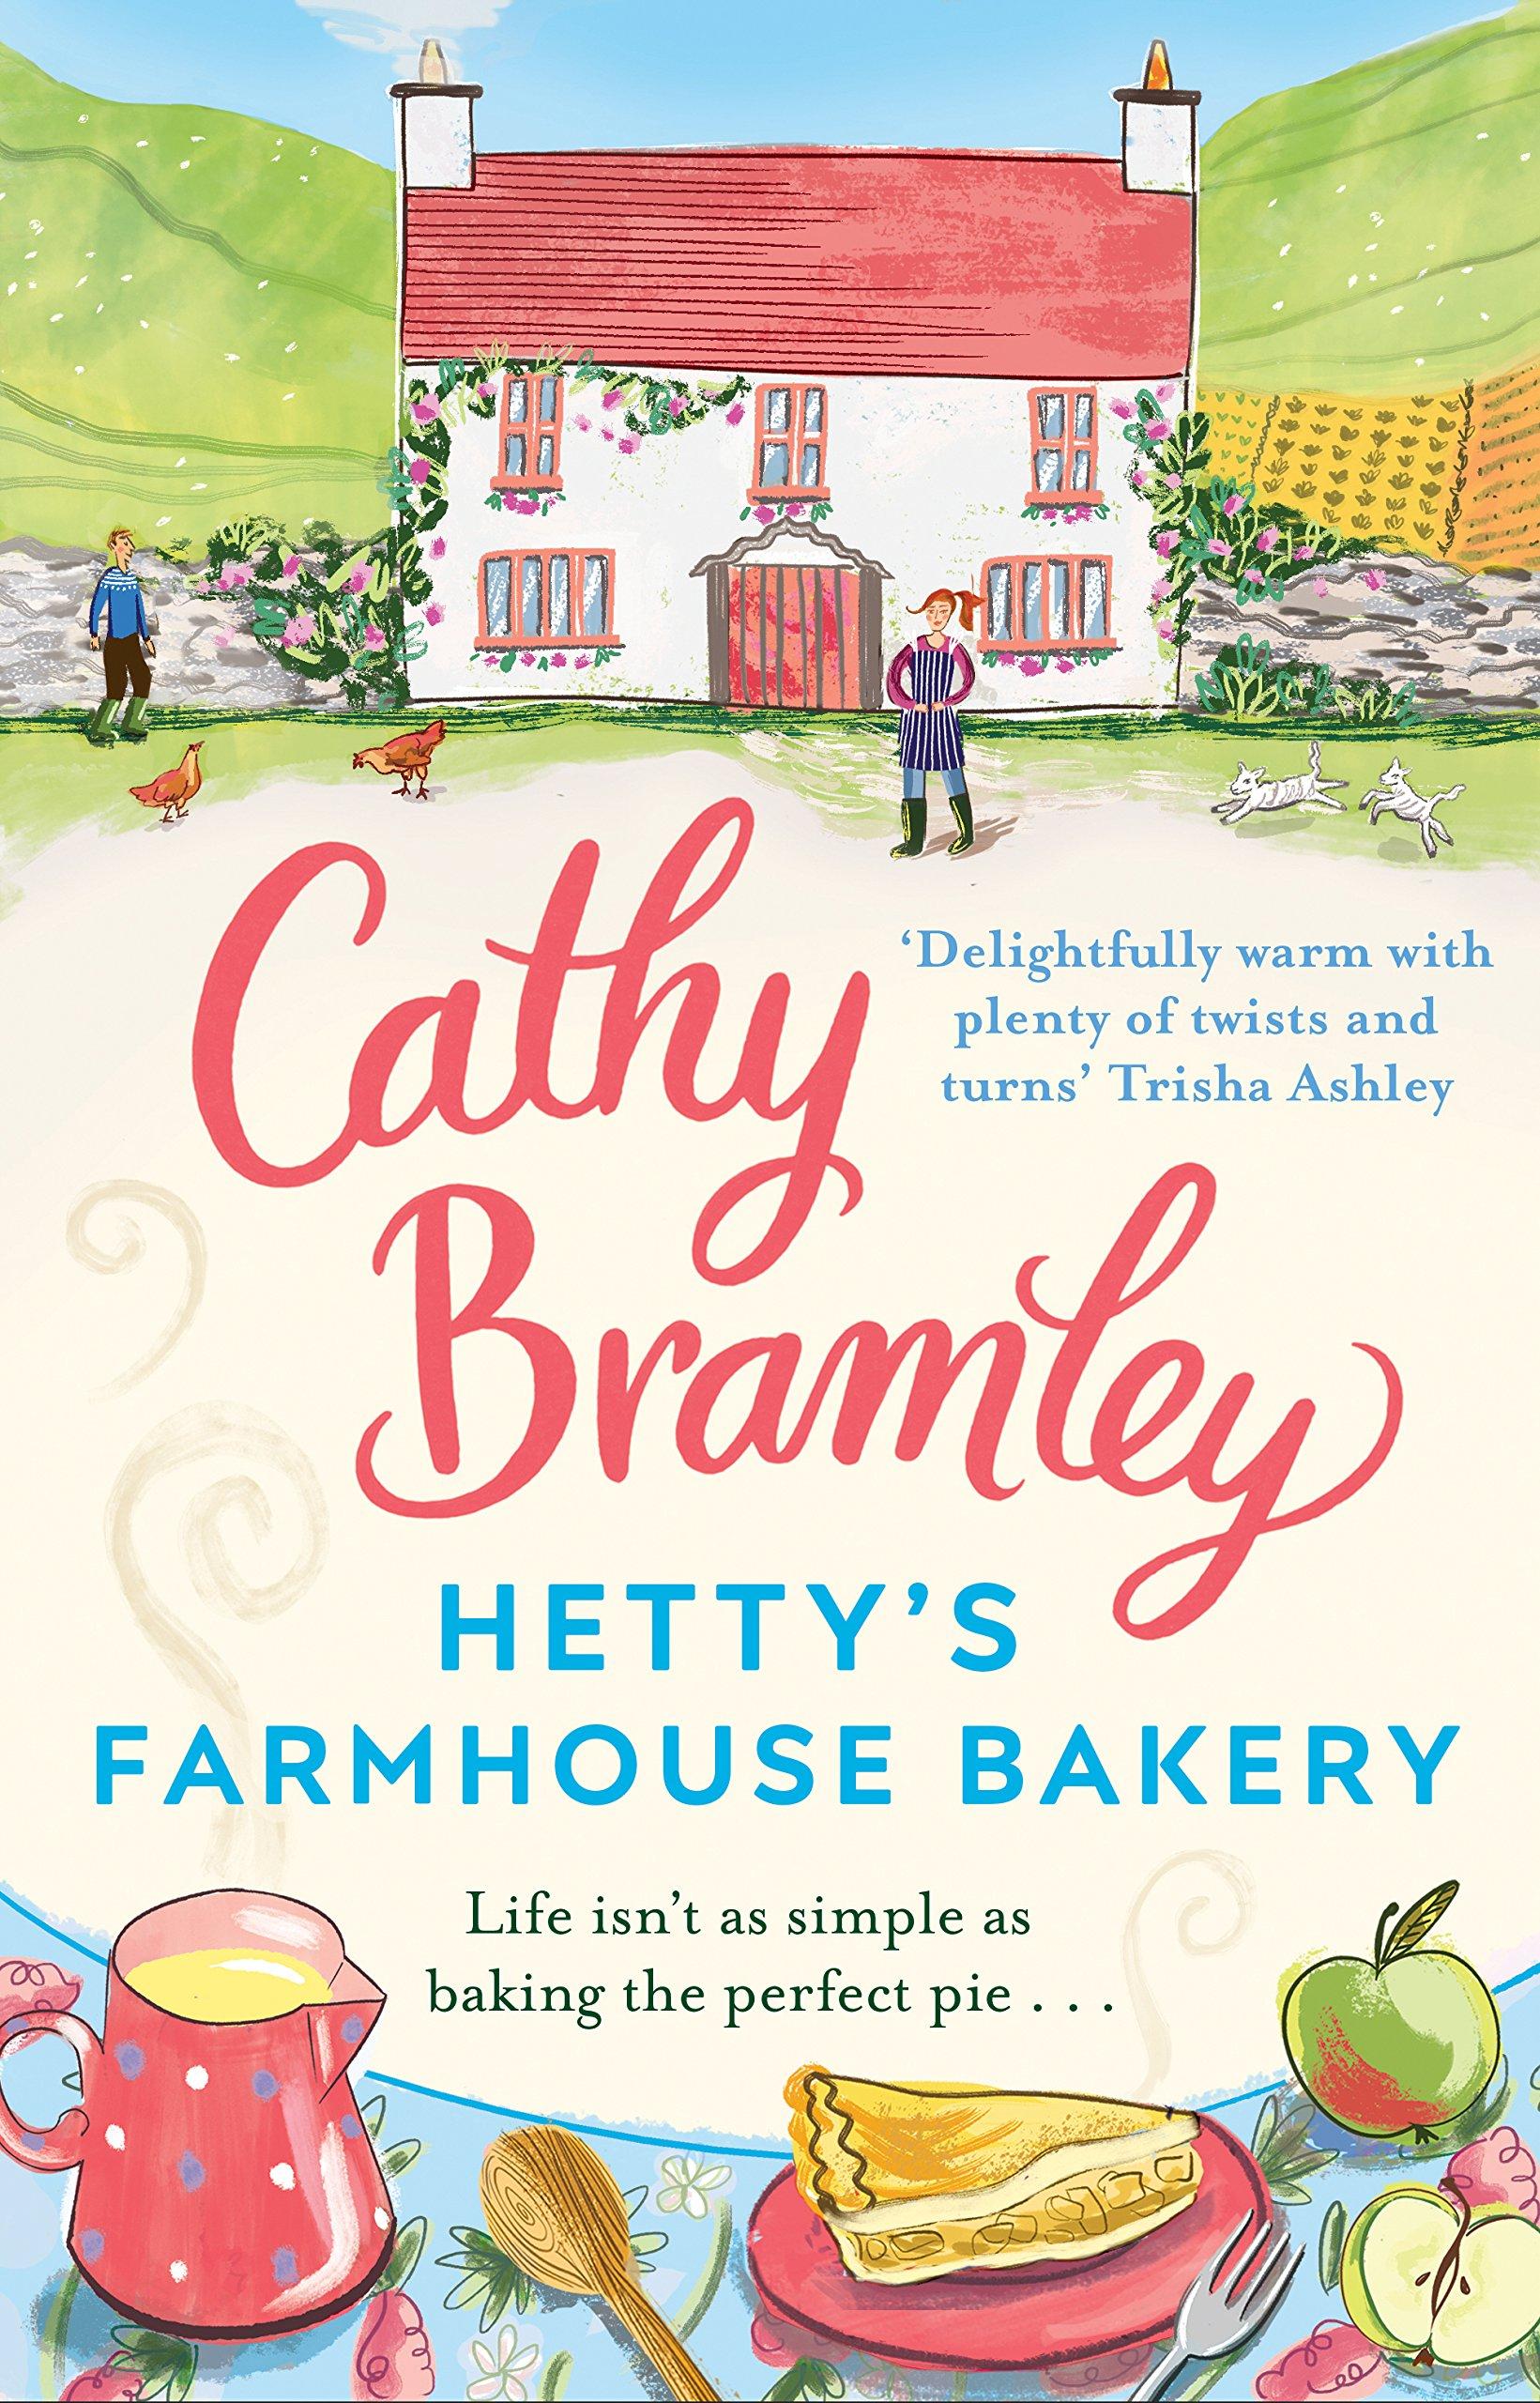 cathy bramley cover farmhouse sarahtanatjones.jpg